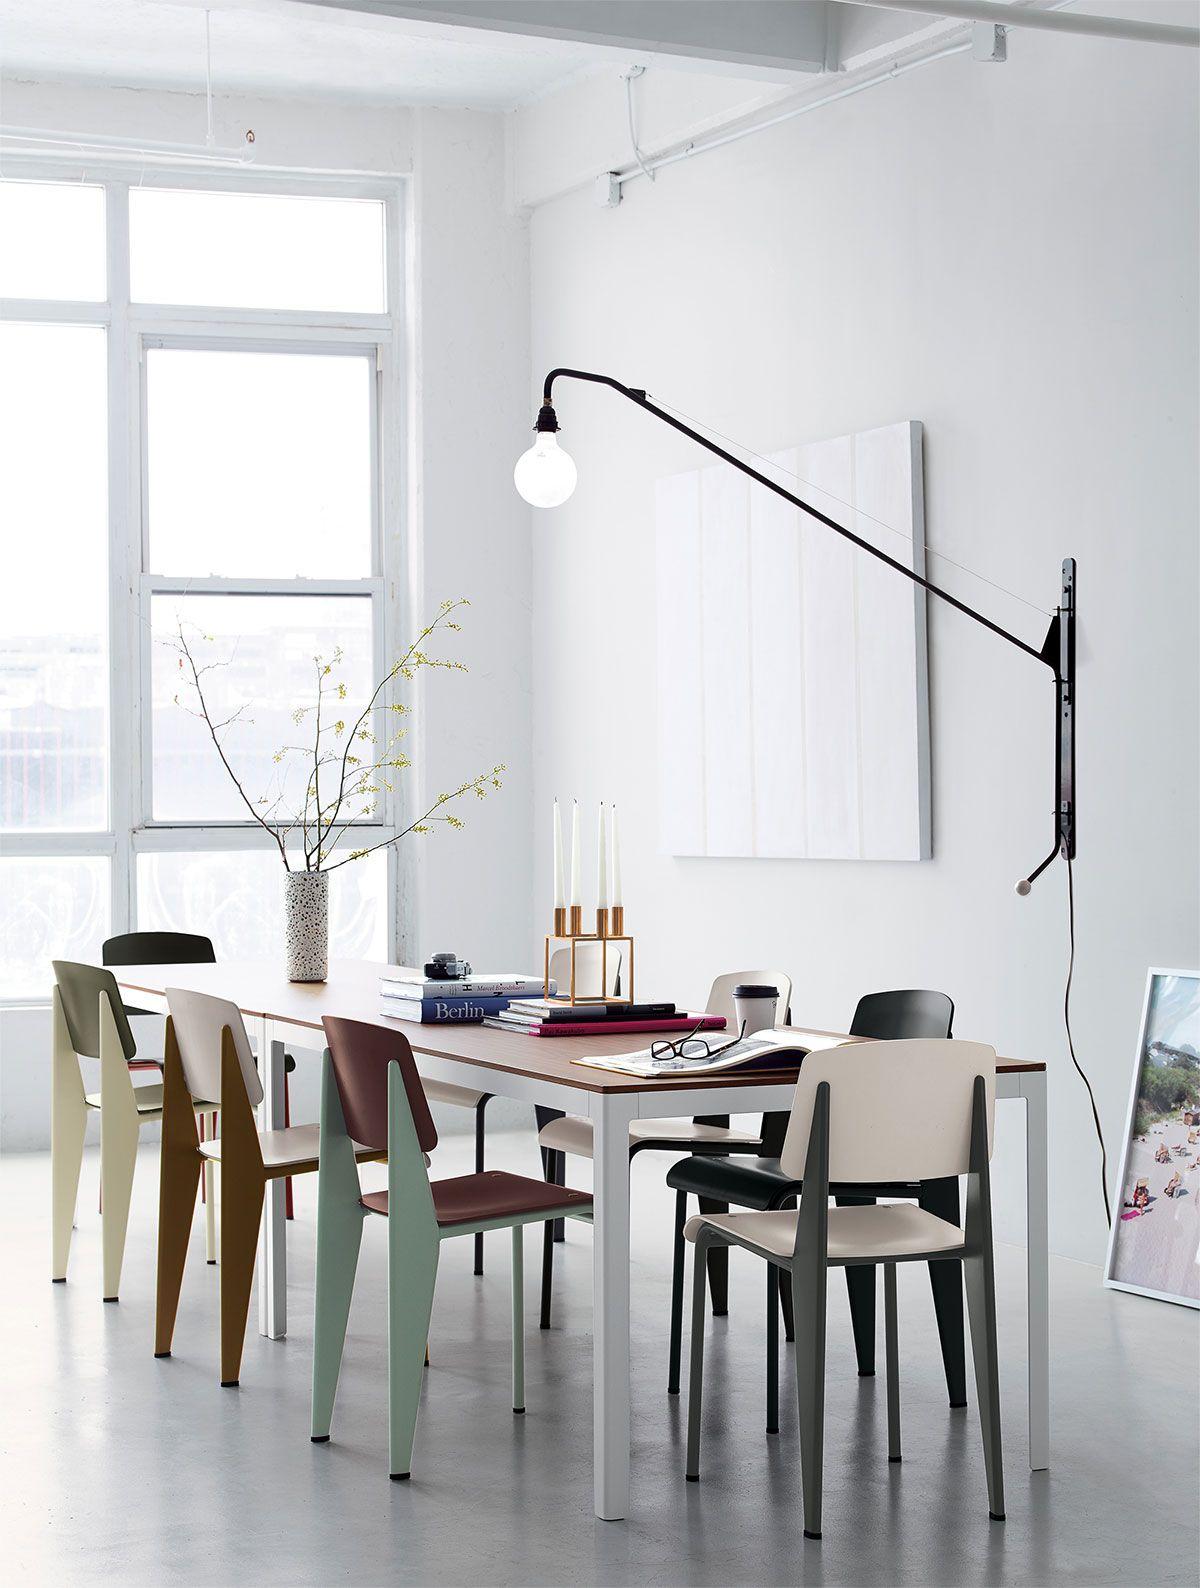 30 Idees Deco D Applique A Bras Articule Chaise Design Coin Salle A Manger Idee Deco